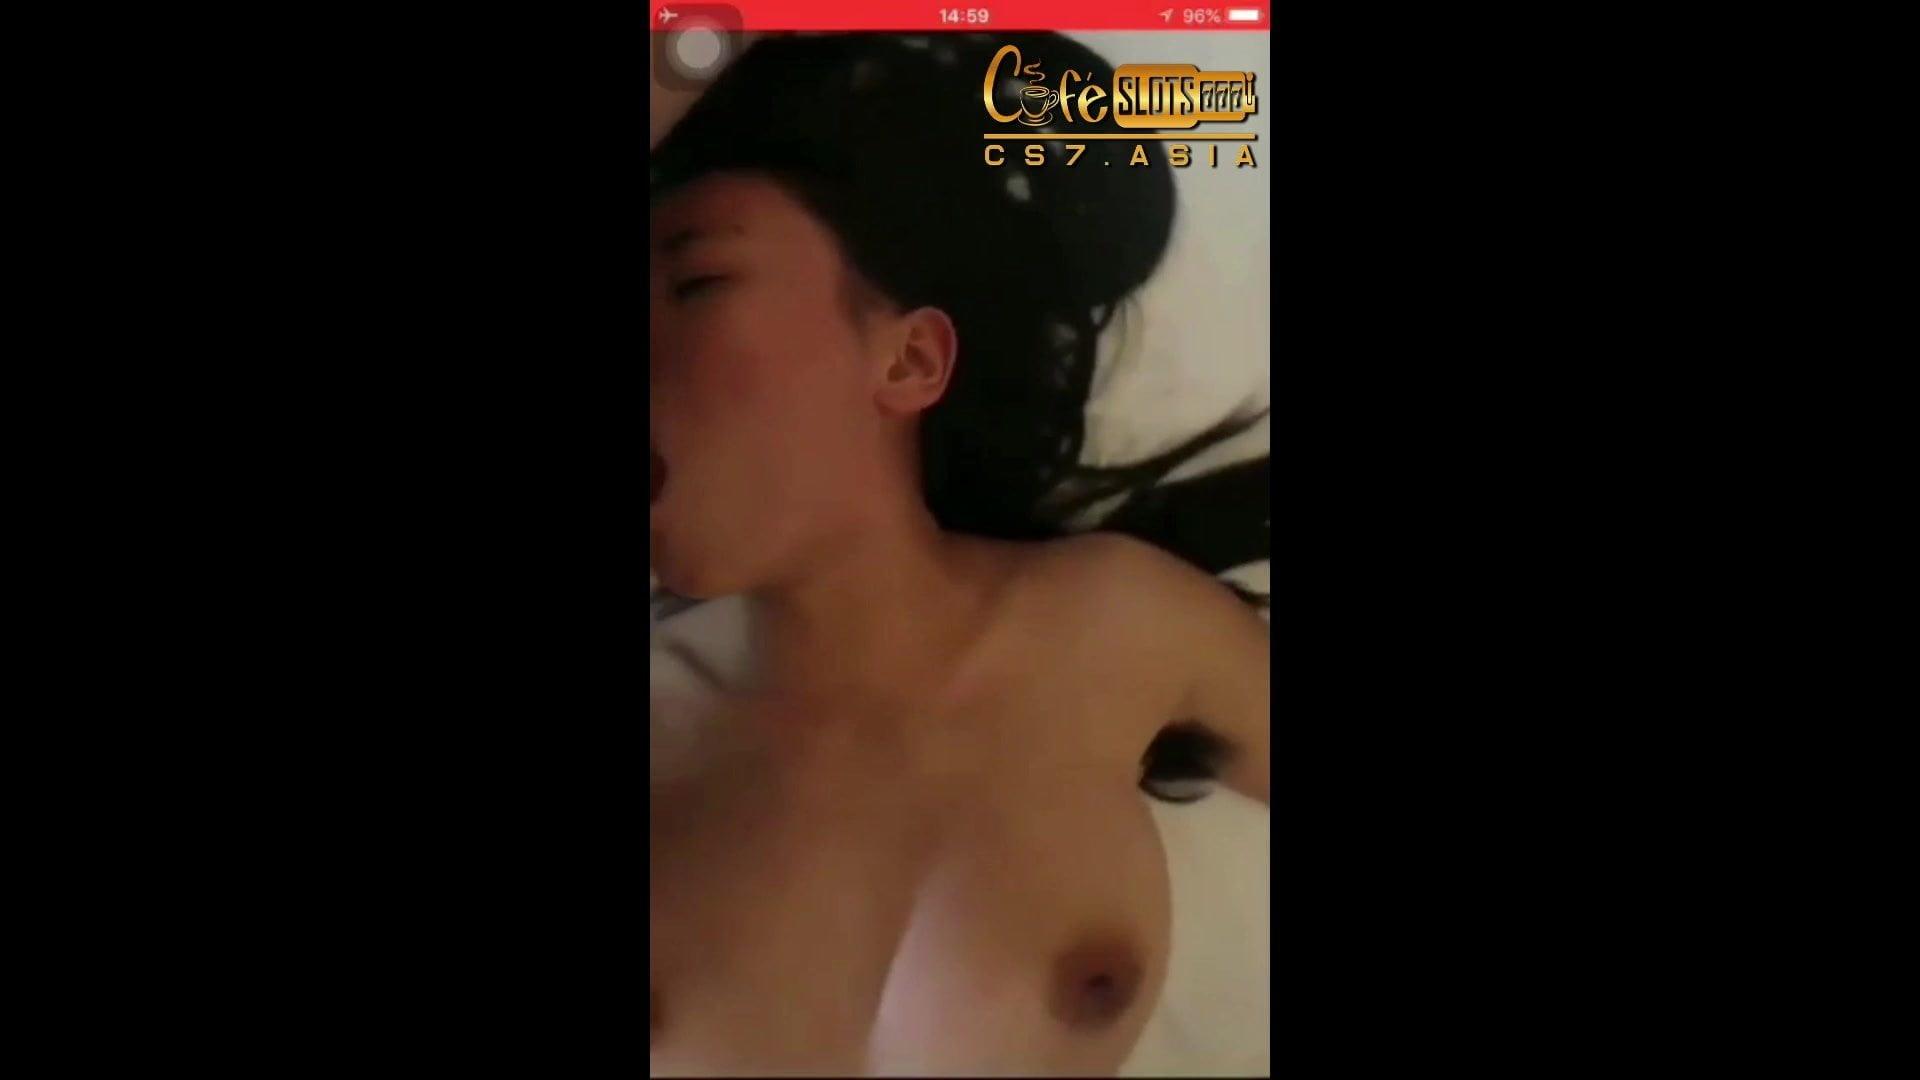 lily collins hot pics